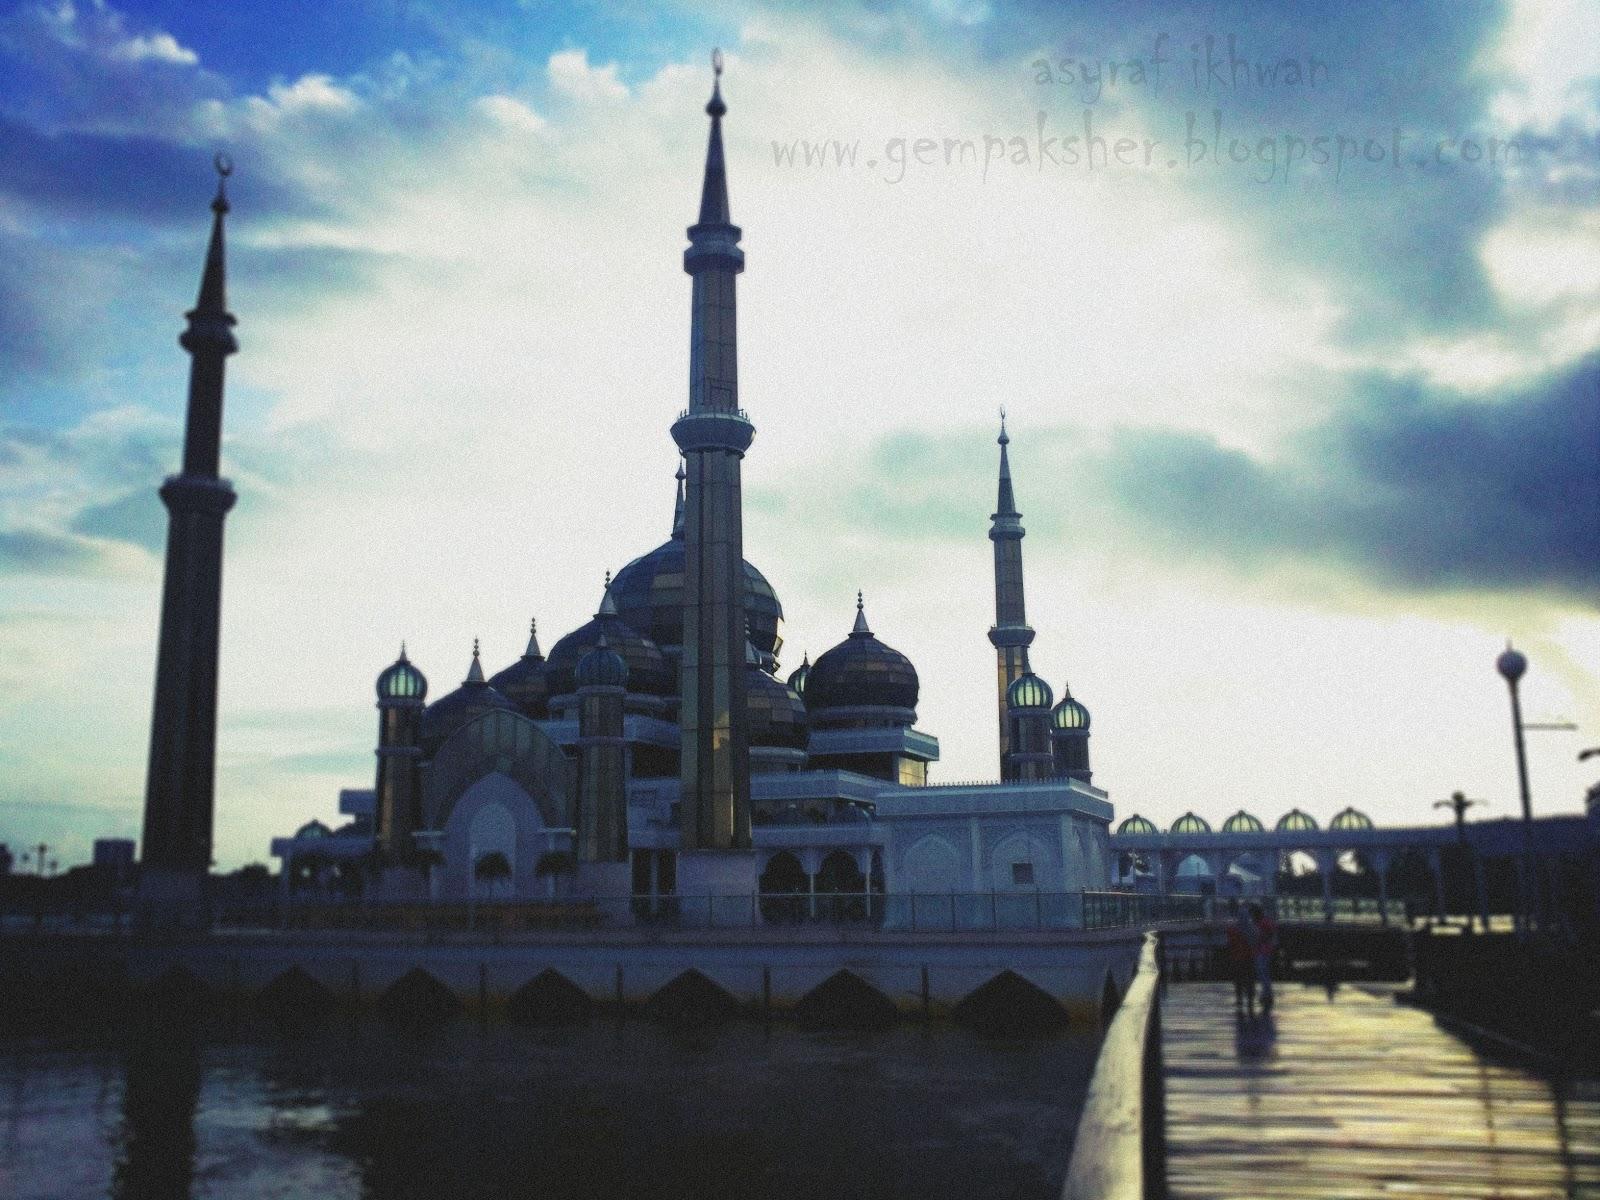 Gempaksher: Masjid Kristal, Kuala Terengganu